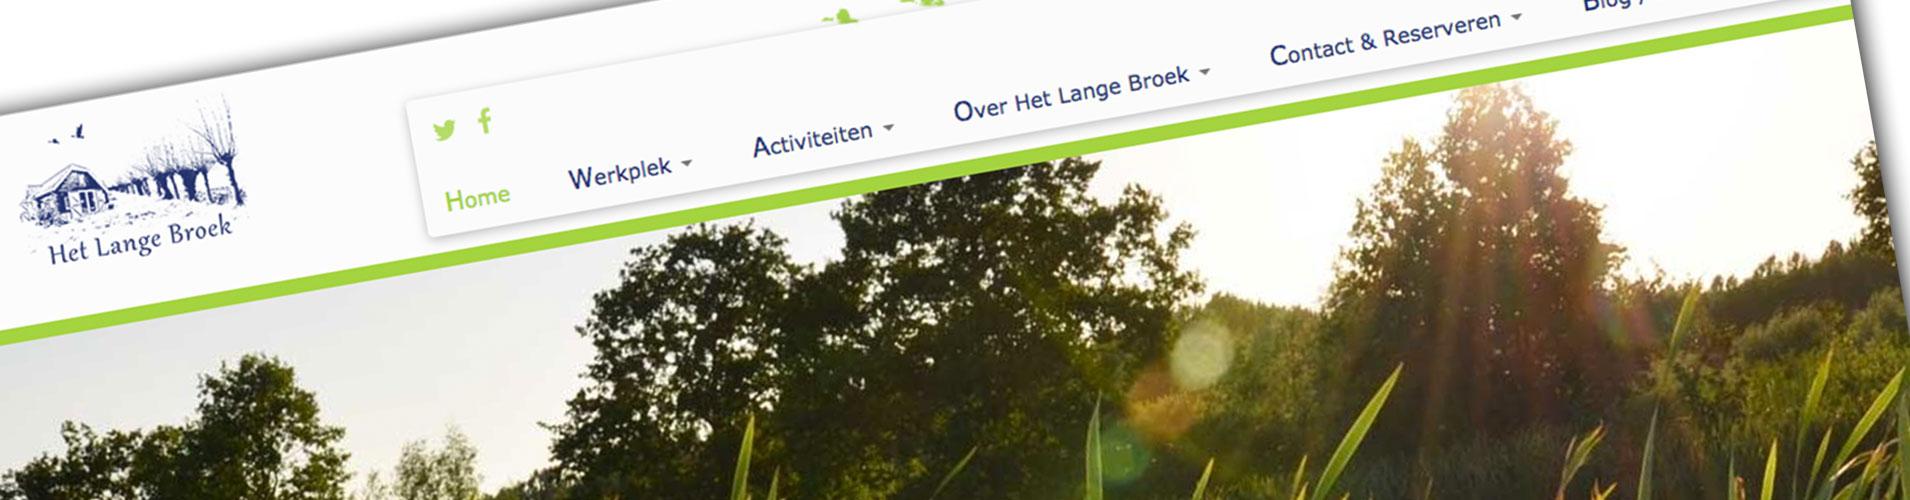 Hel Lange Broek